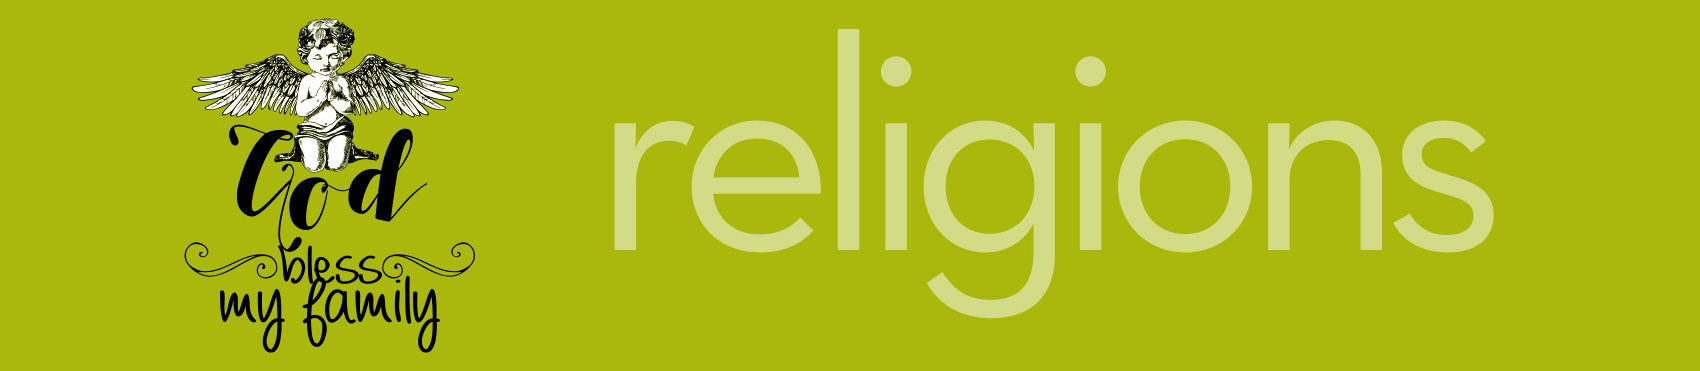 Religions logo ideas